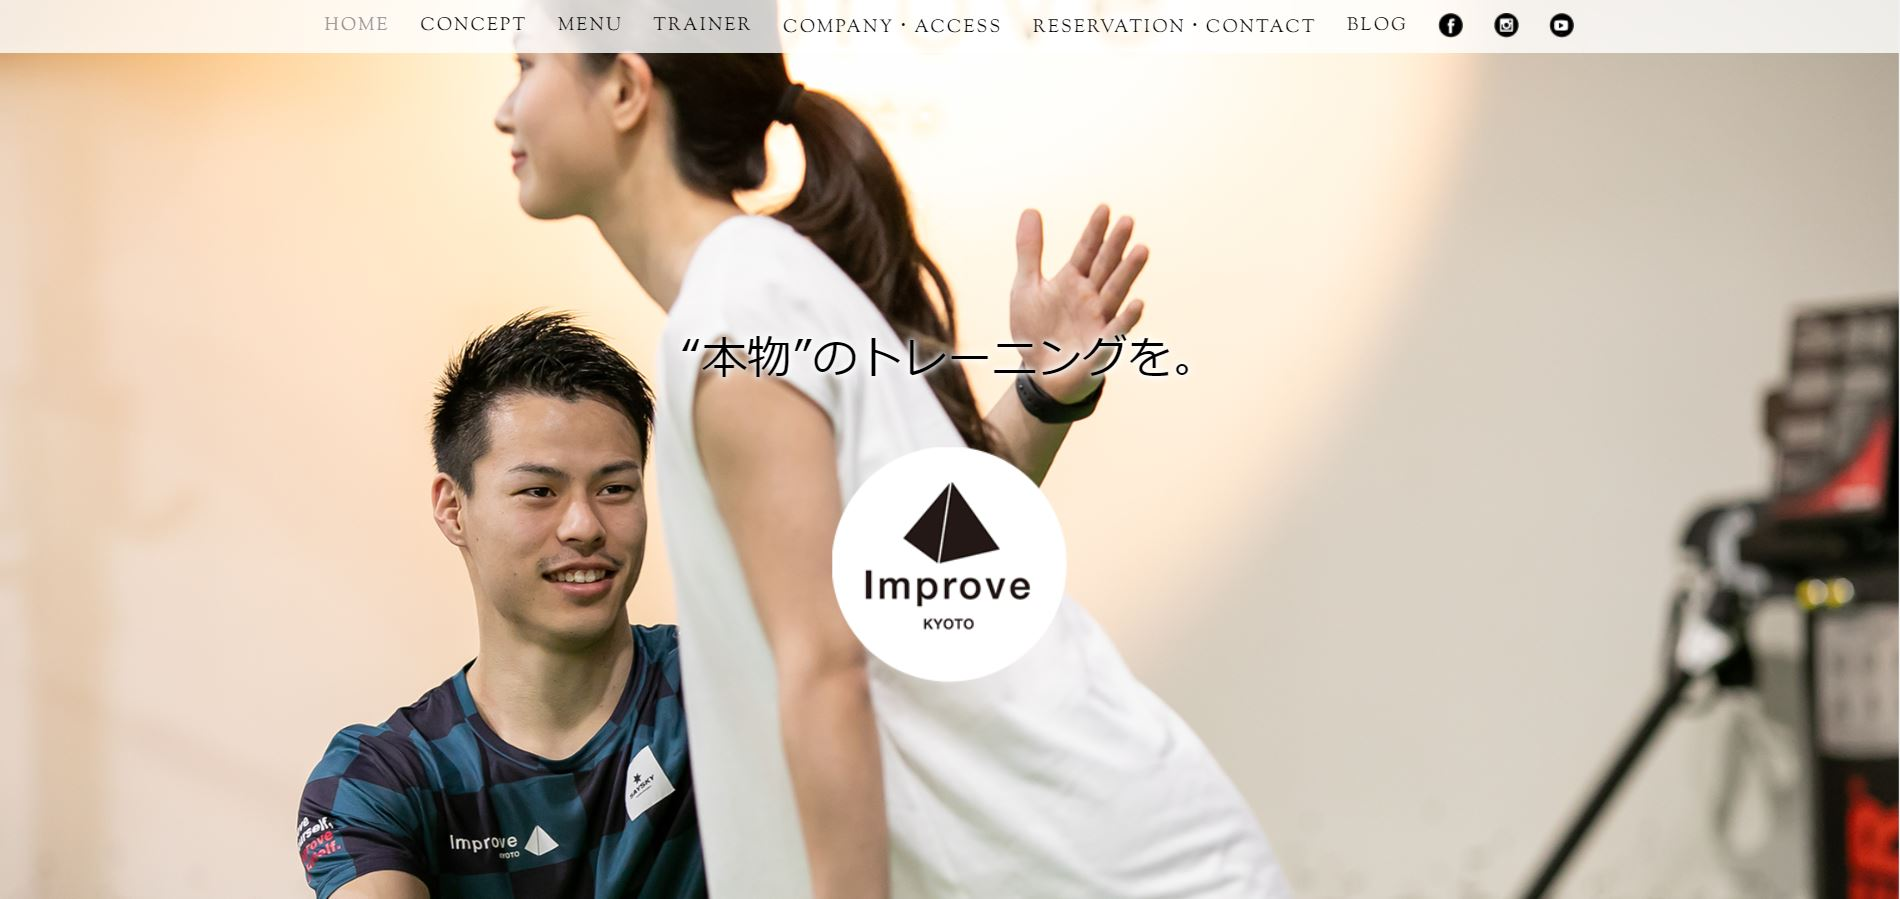 Improve KYOTO (インプルーブ京都)